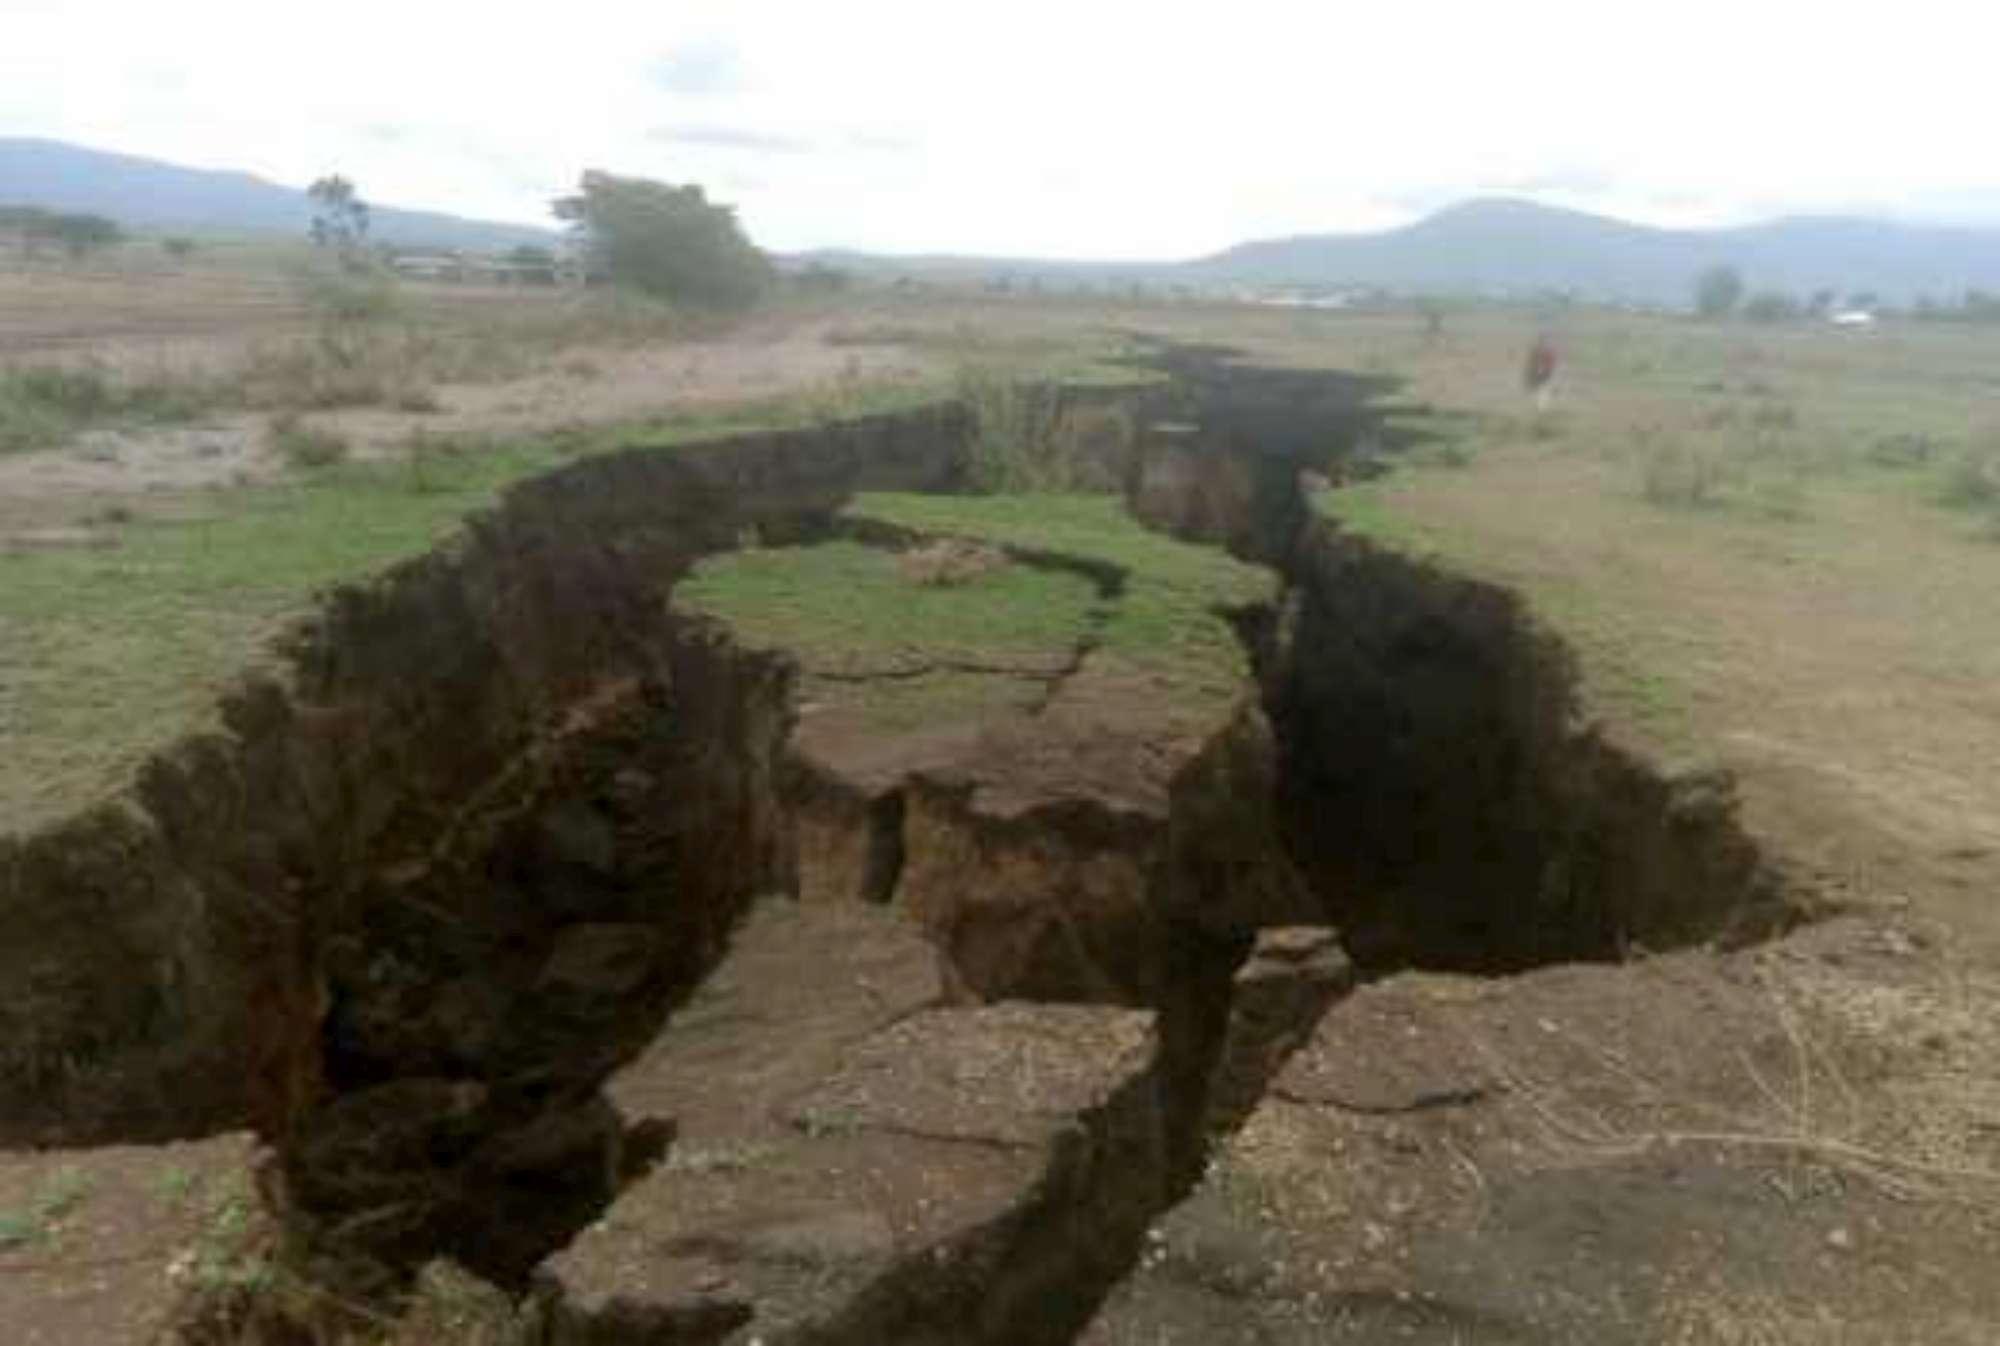 Kenya, la terra si apre: per i geologi la spaccatura dividerà l'Africa in due